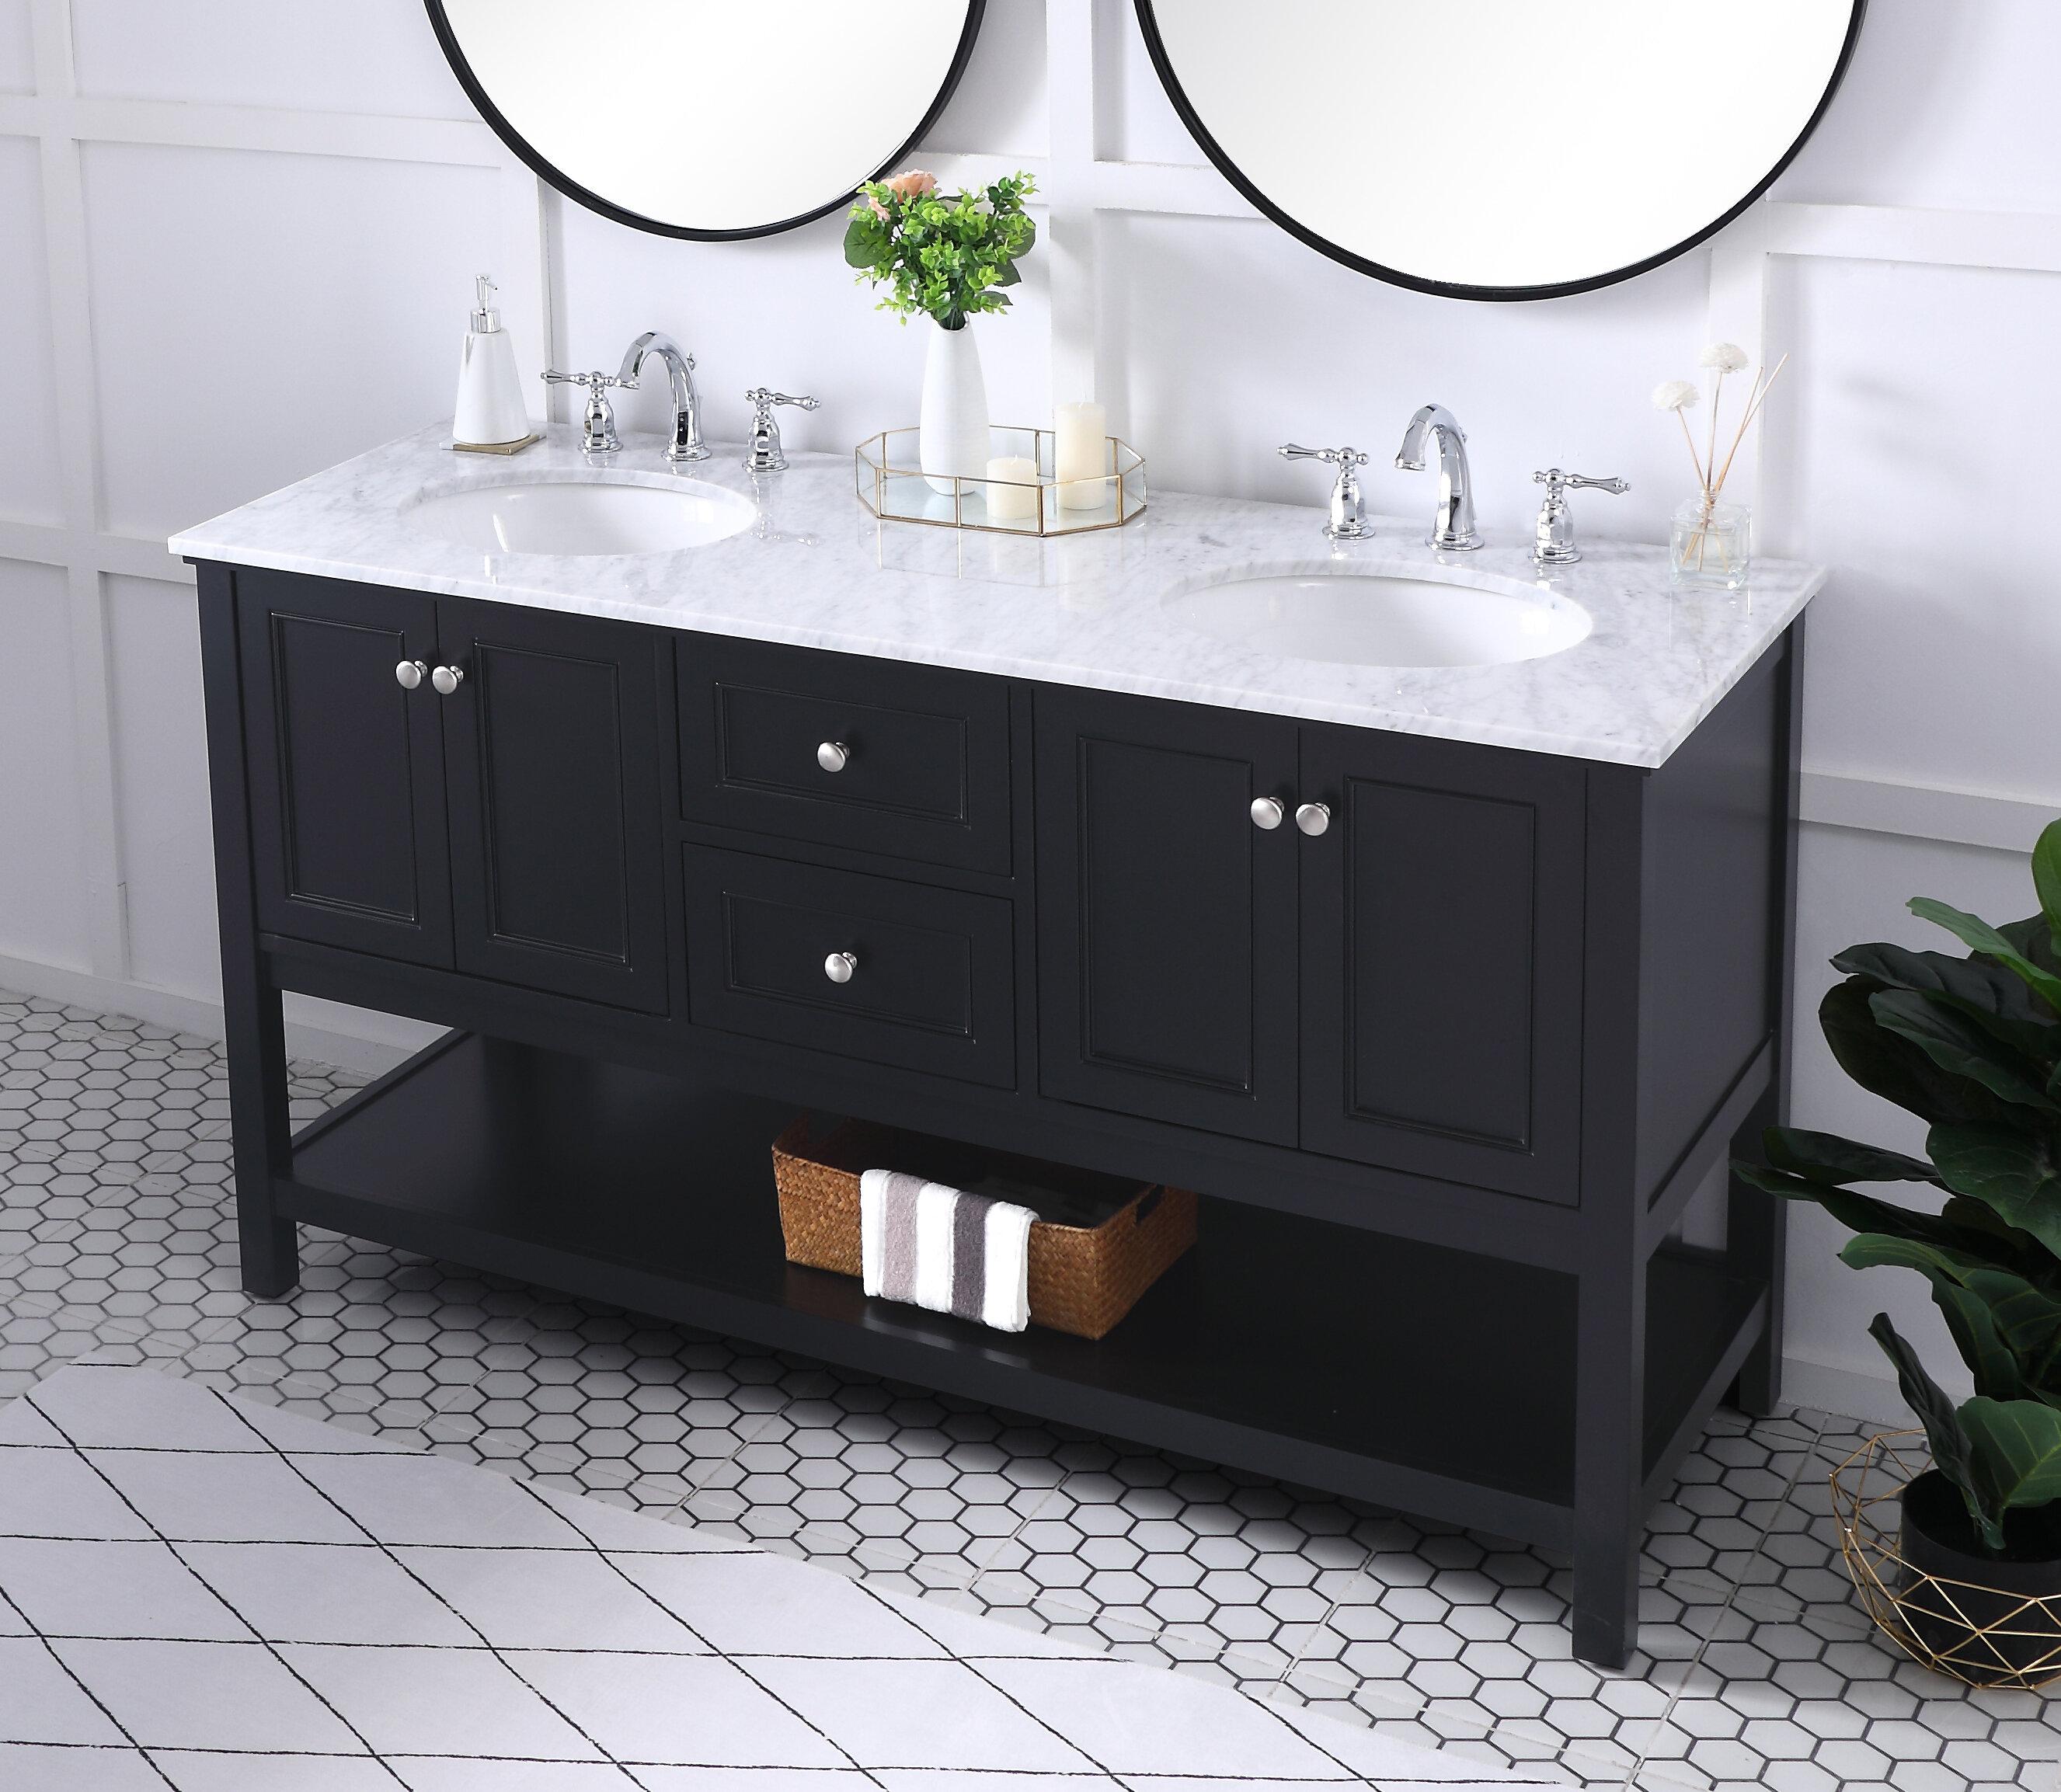 Black Bathroom Vanities Free Shipping Over 35 Wayfair